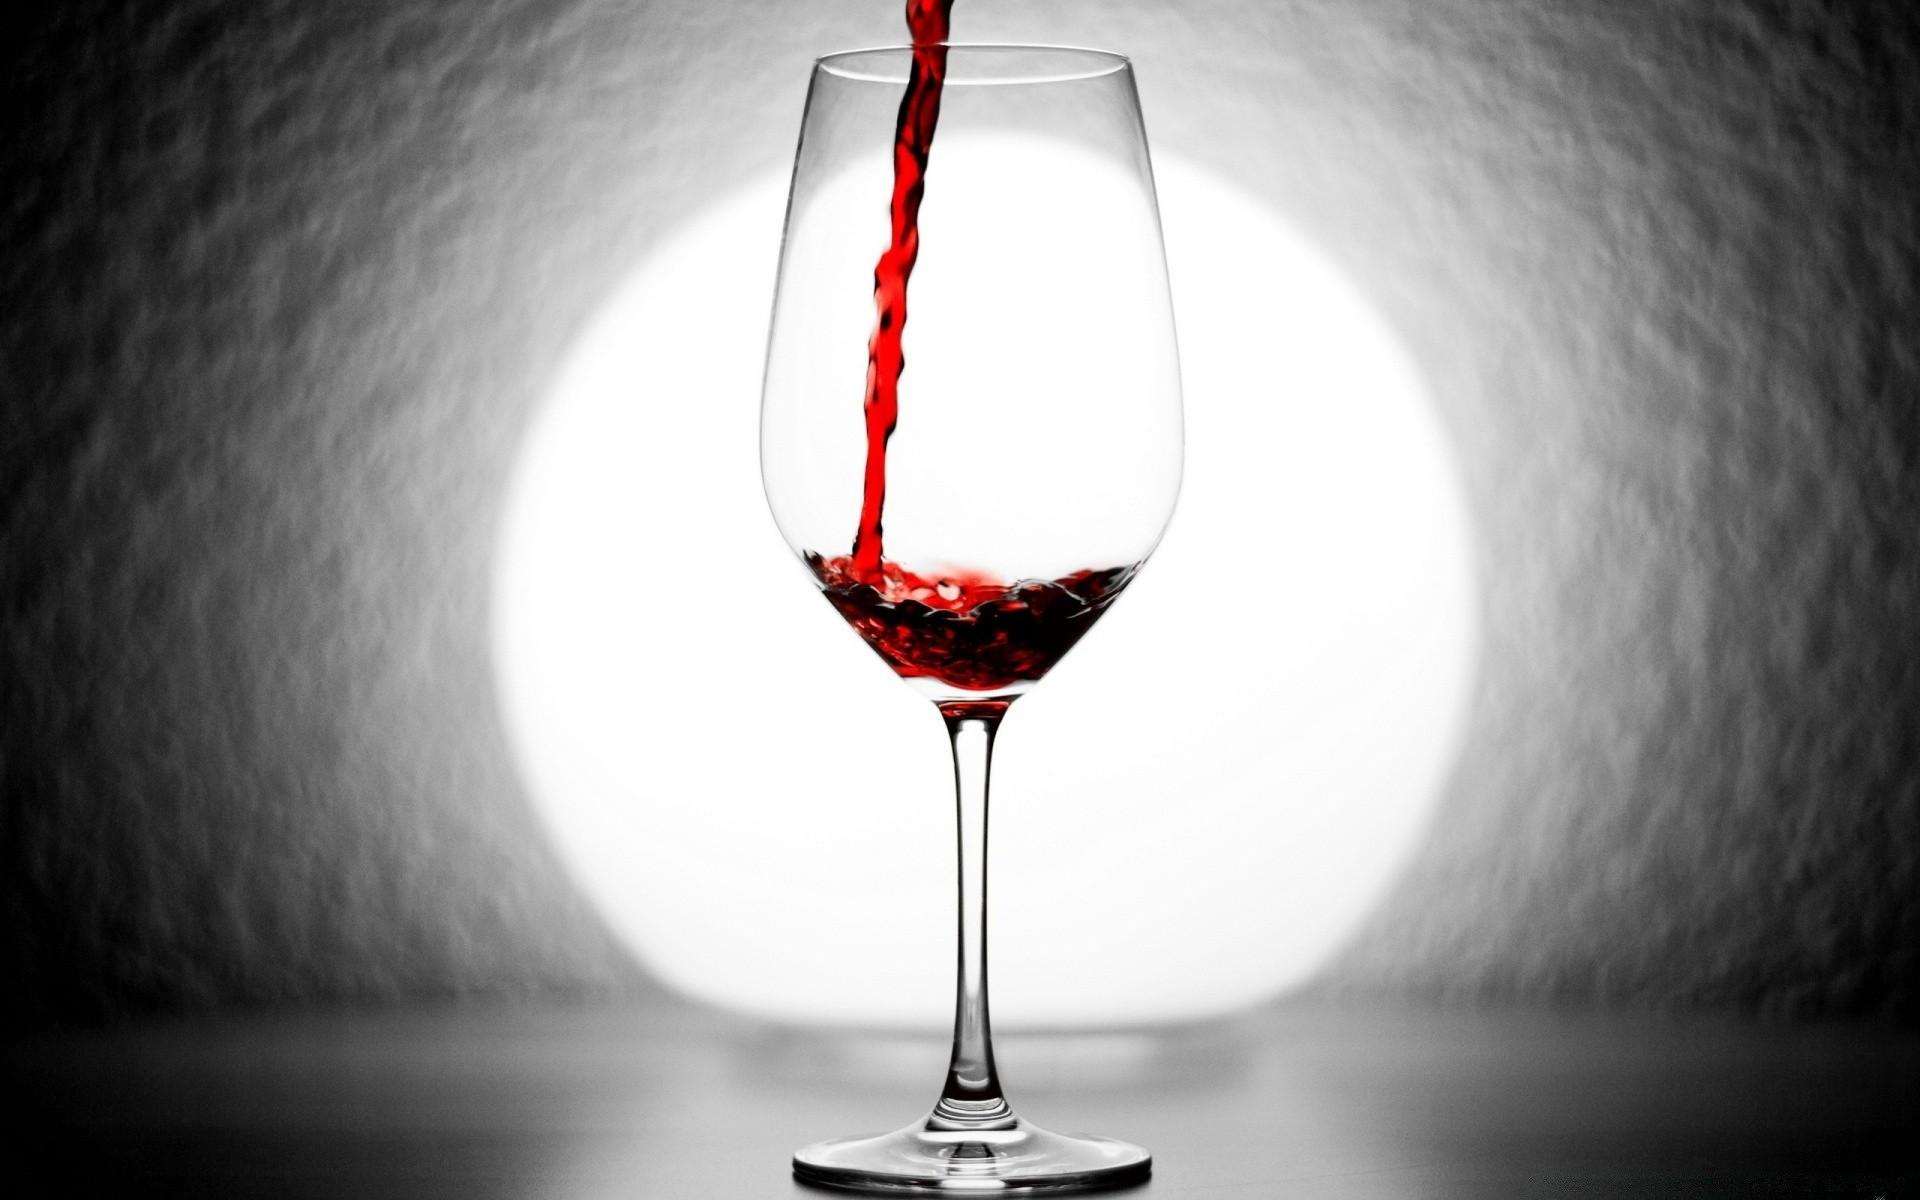 можно обои на рабочий стол бокал красного вина могу